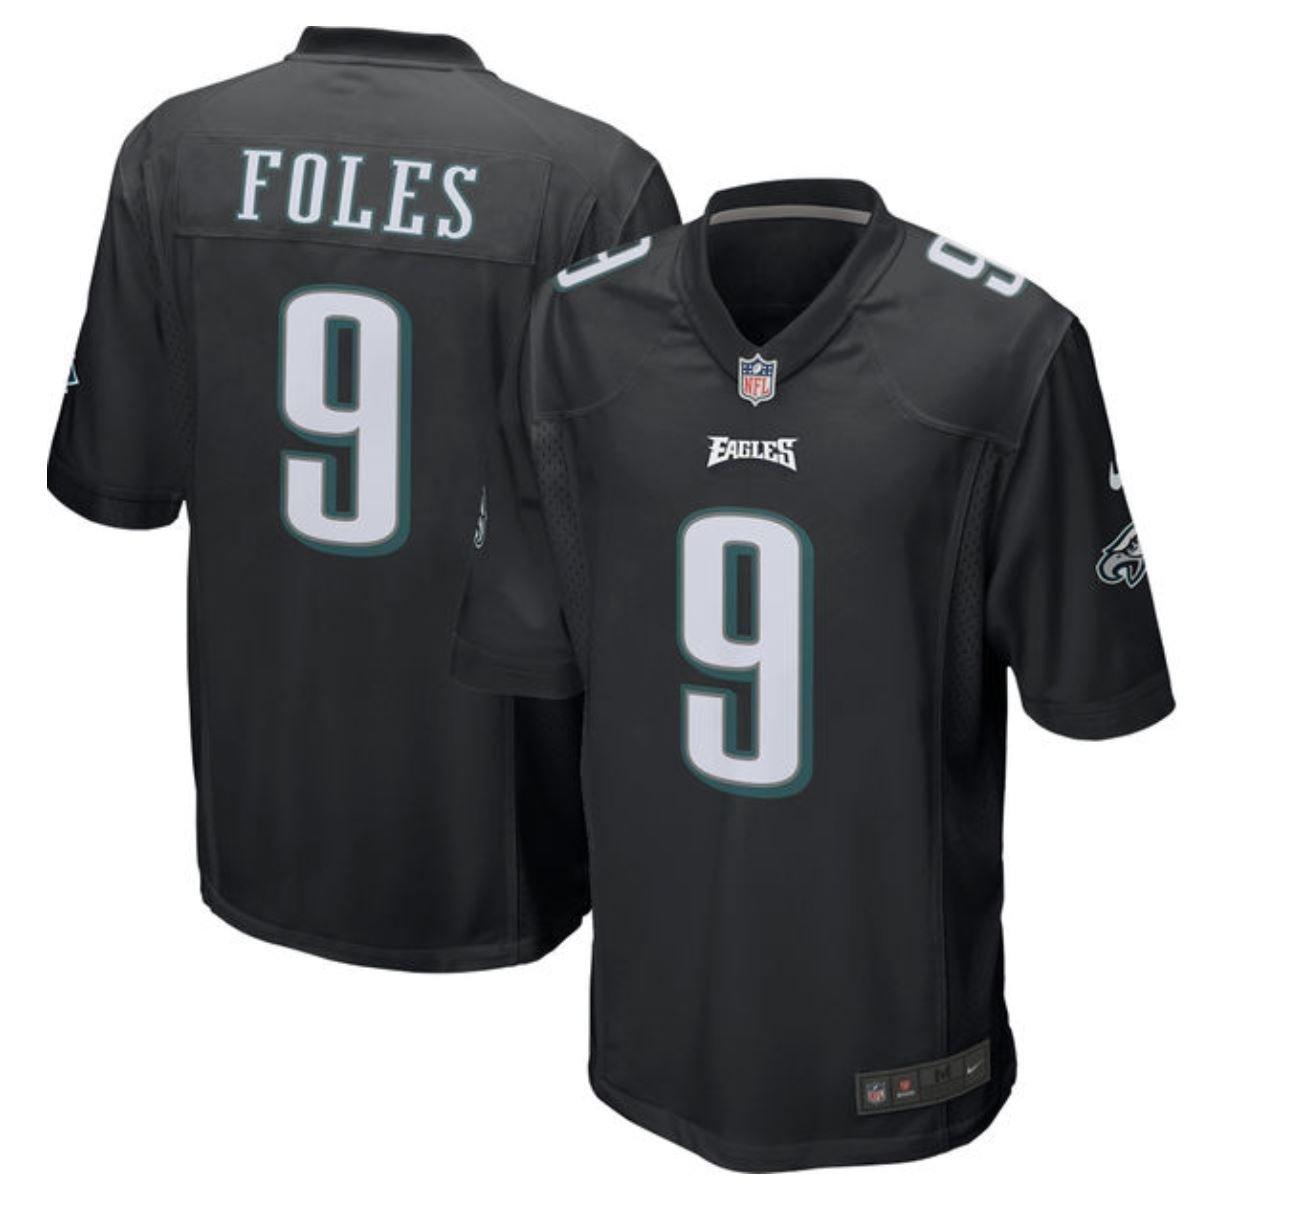 the best attitude d1a5d bf538 Nike Nick Foles Philadelphia Eagles Black Event Jersey ...